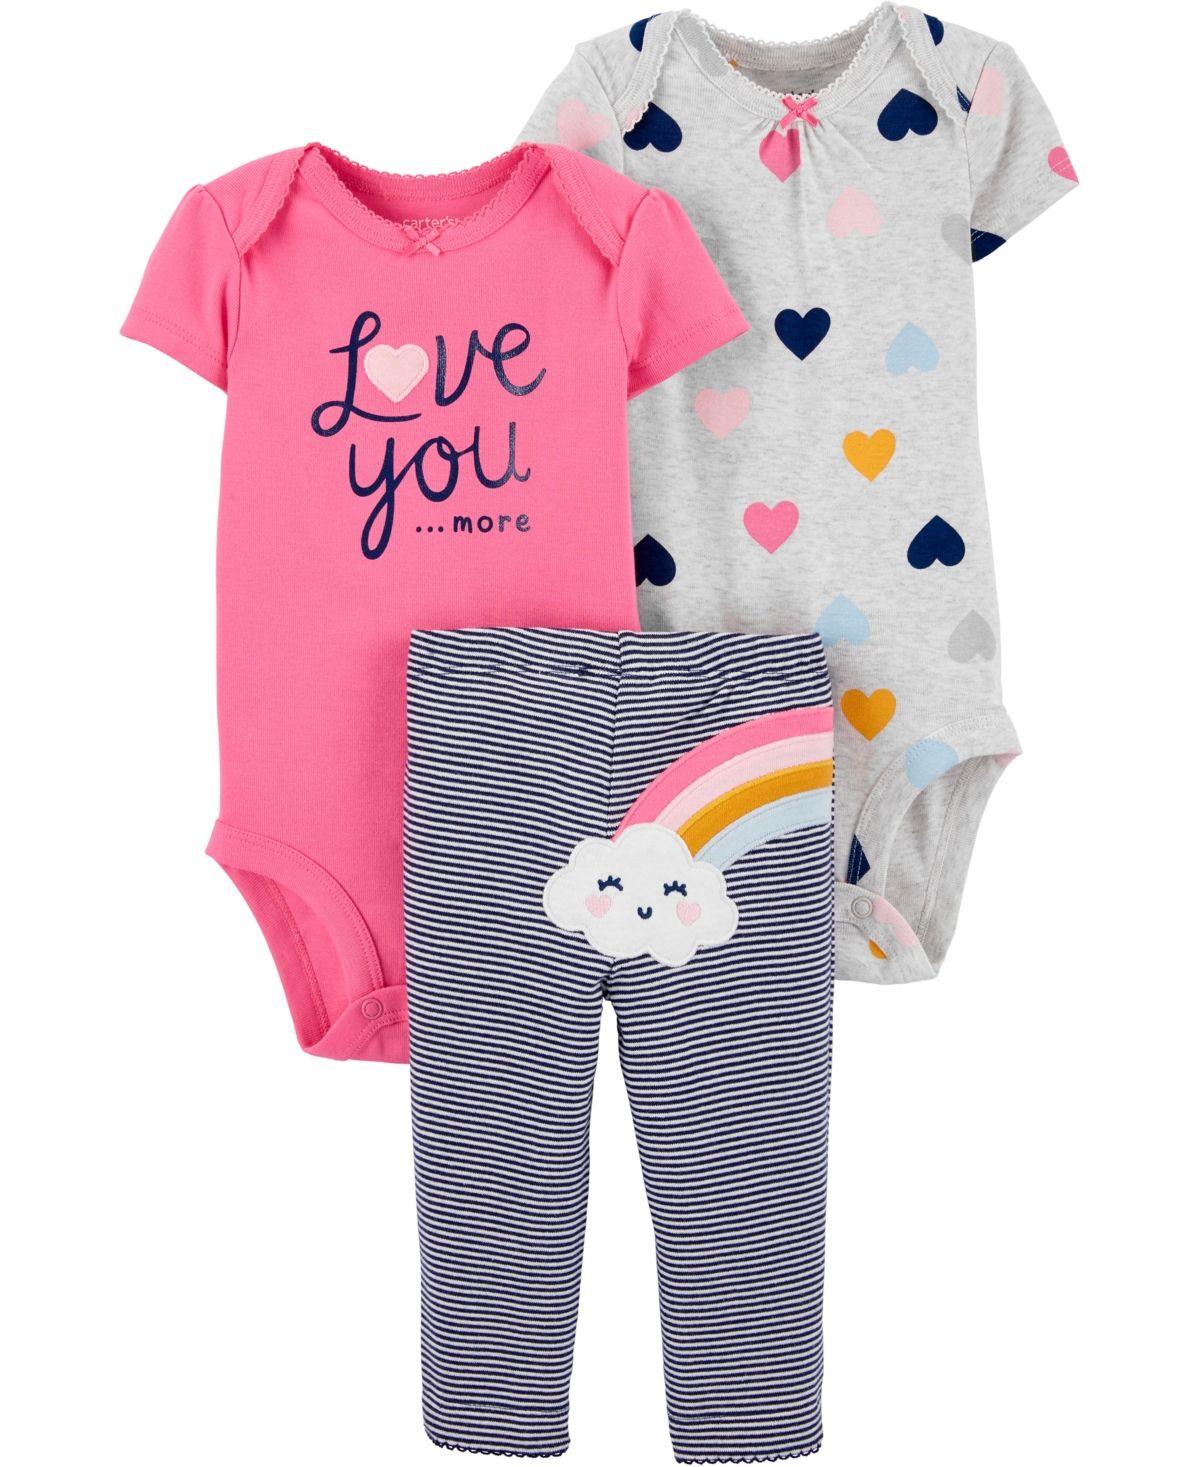 newborn leggings stretchy pants baby legging cloth diaper pants baby girl pants Infant leggings spring floral legging floral leggings